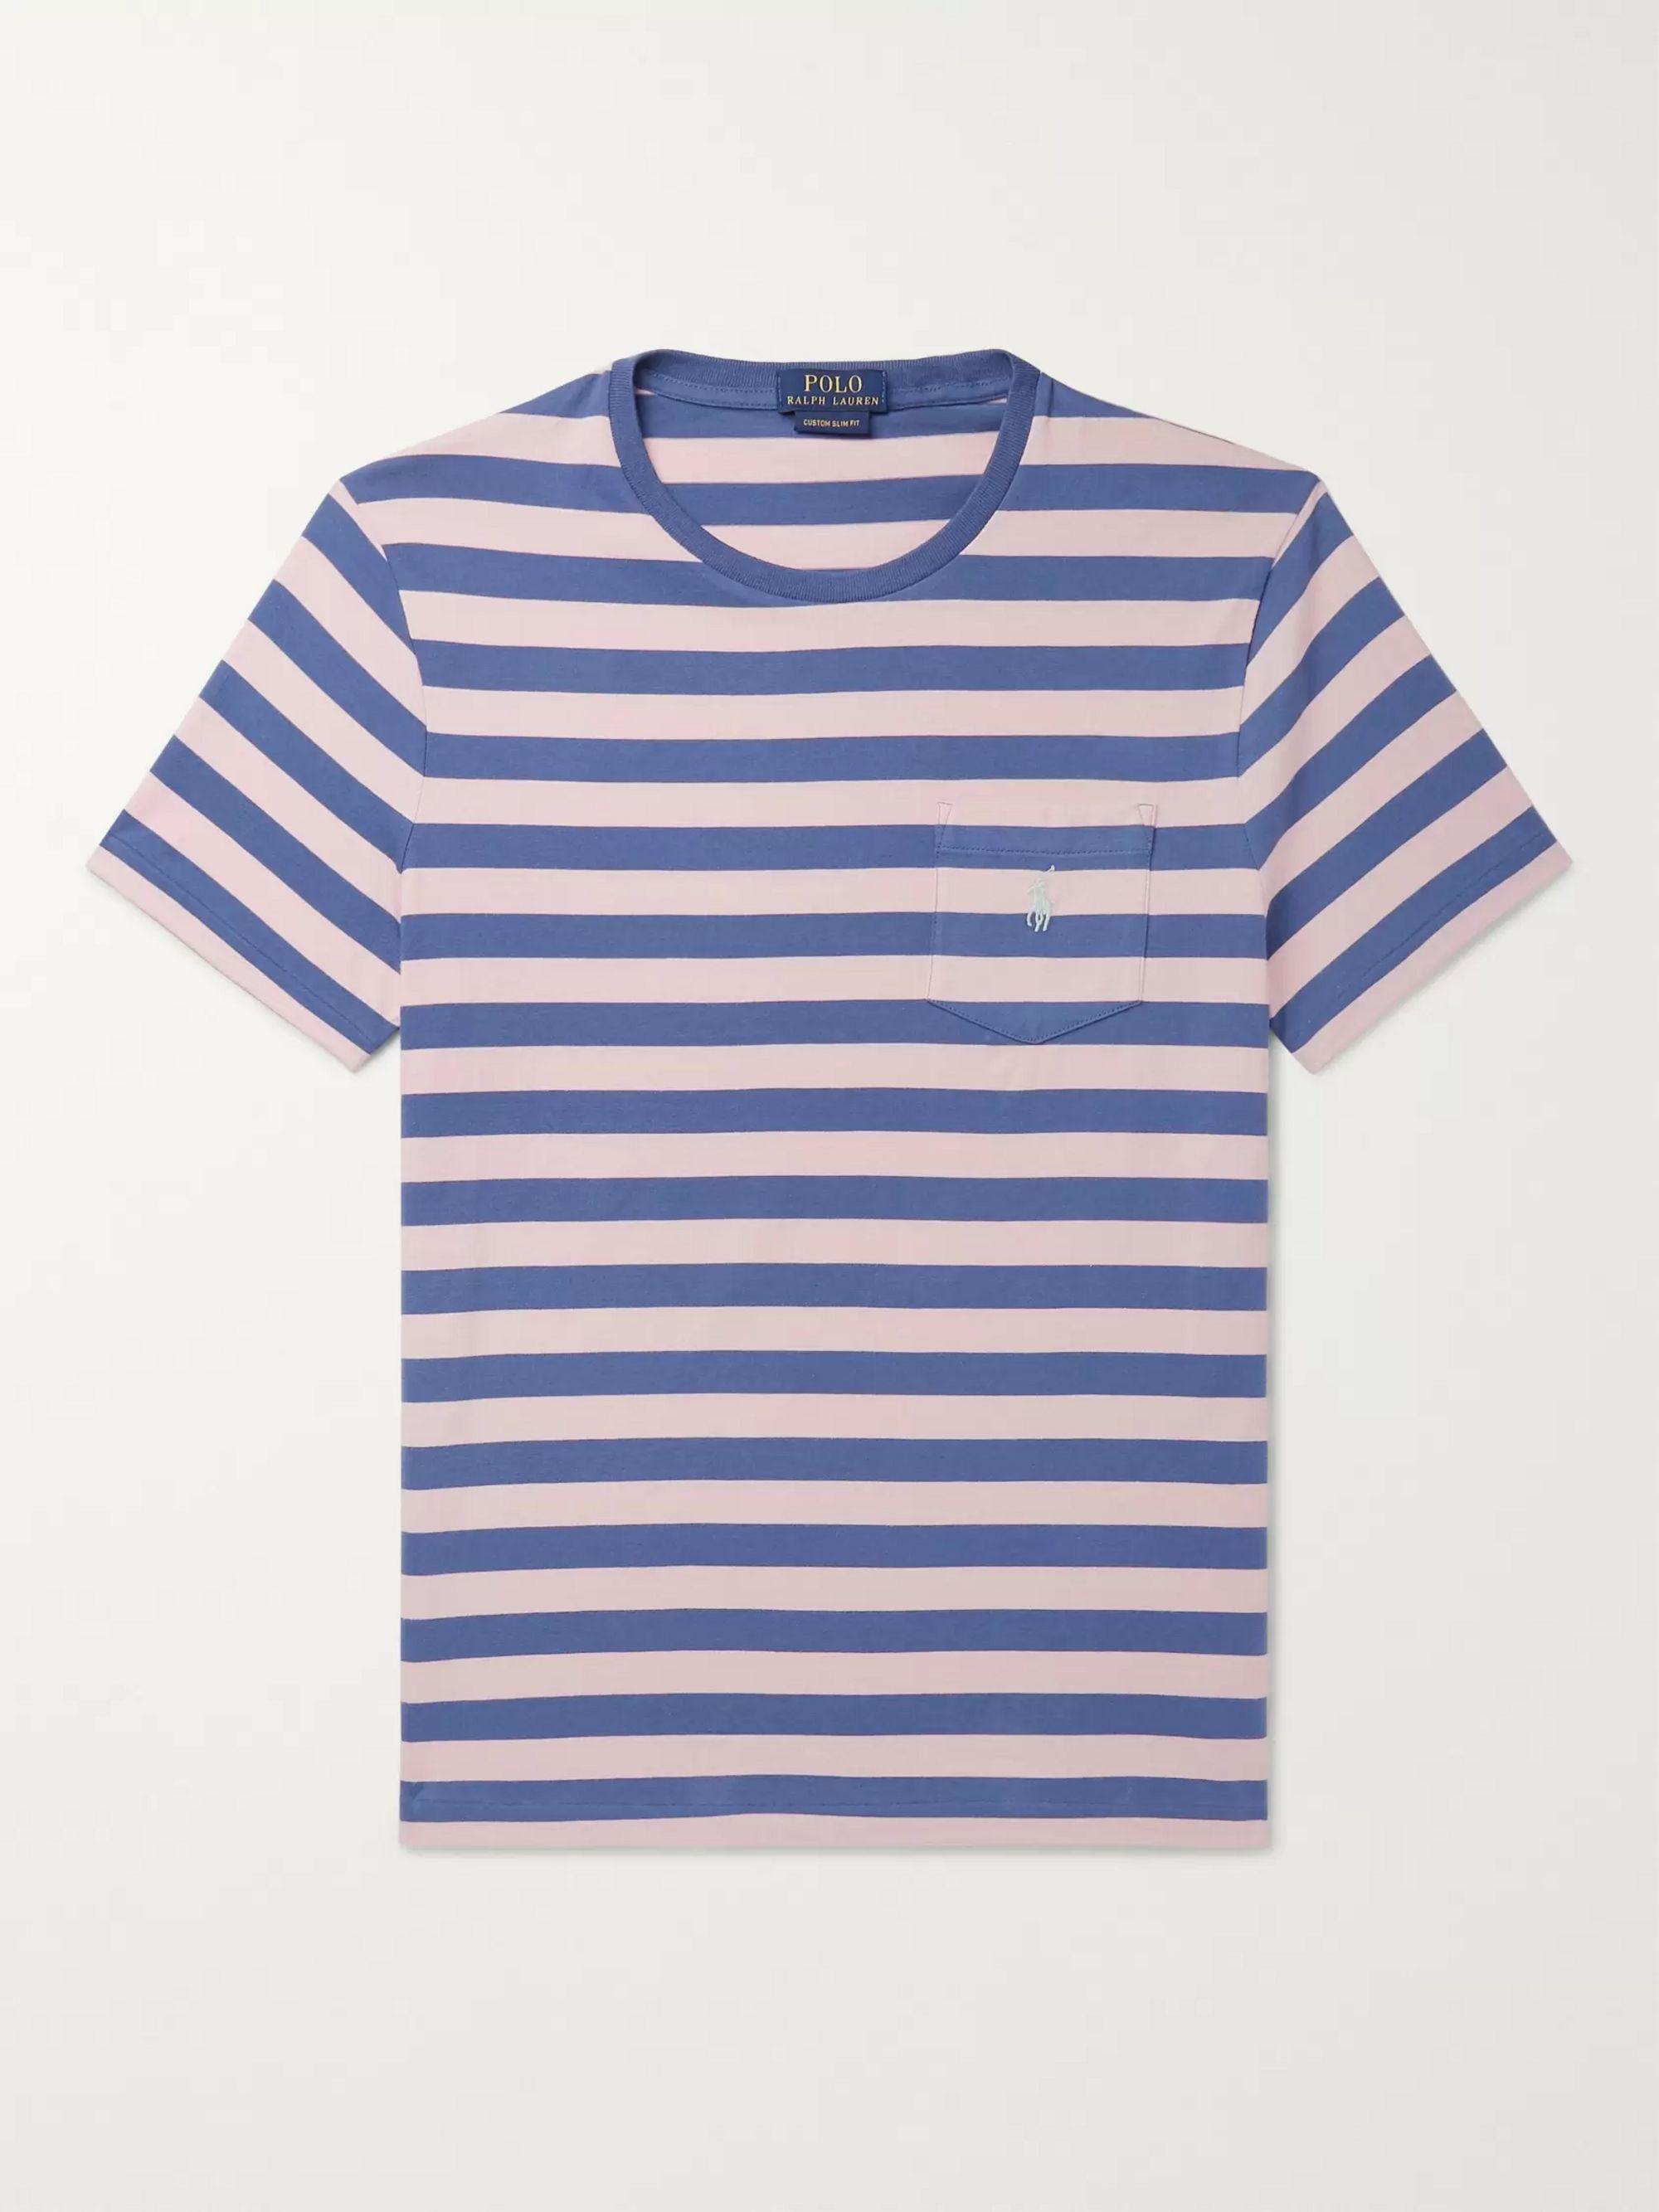 Cotton Jersey T Shirt Slim Striped Fit IybY6mfg7v